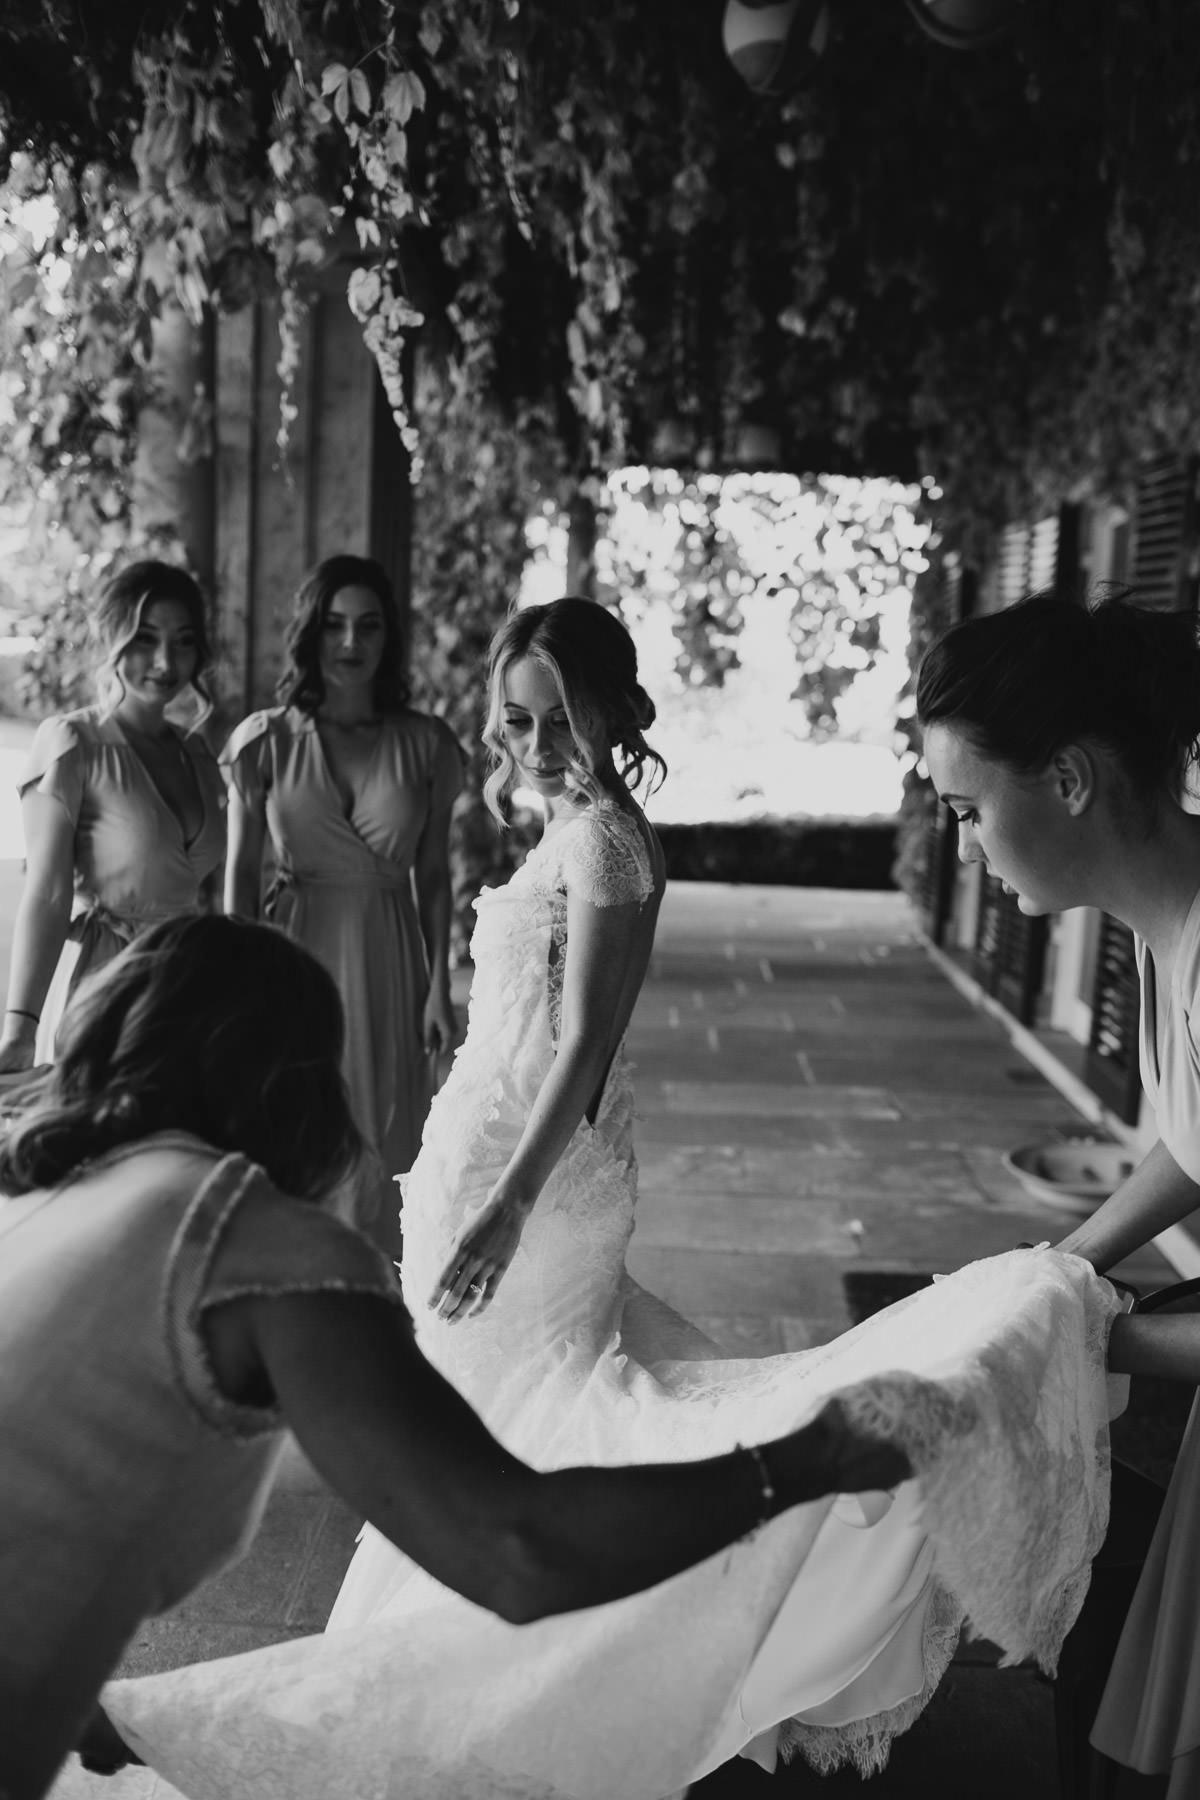 160506_justinaaron_wedding_holly_daniel_pr-44.jpg